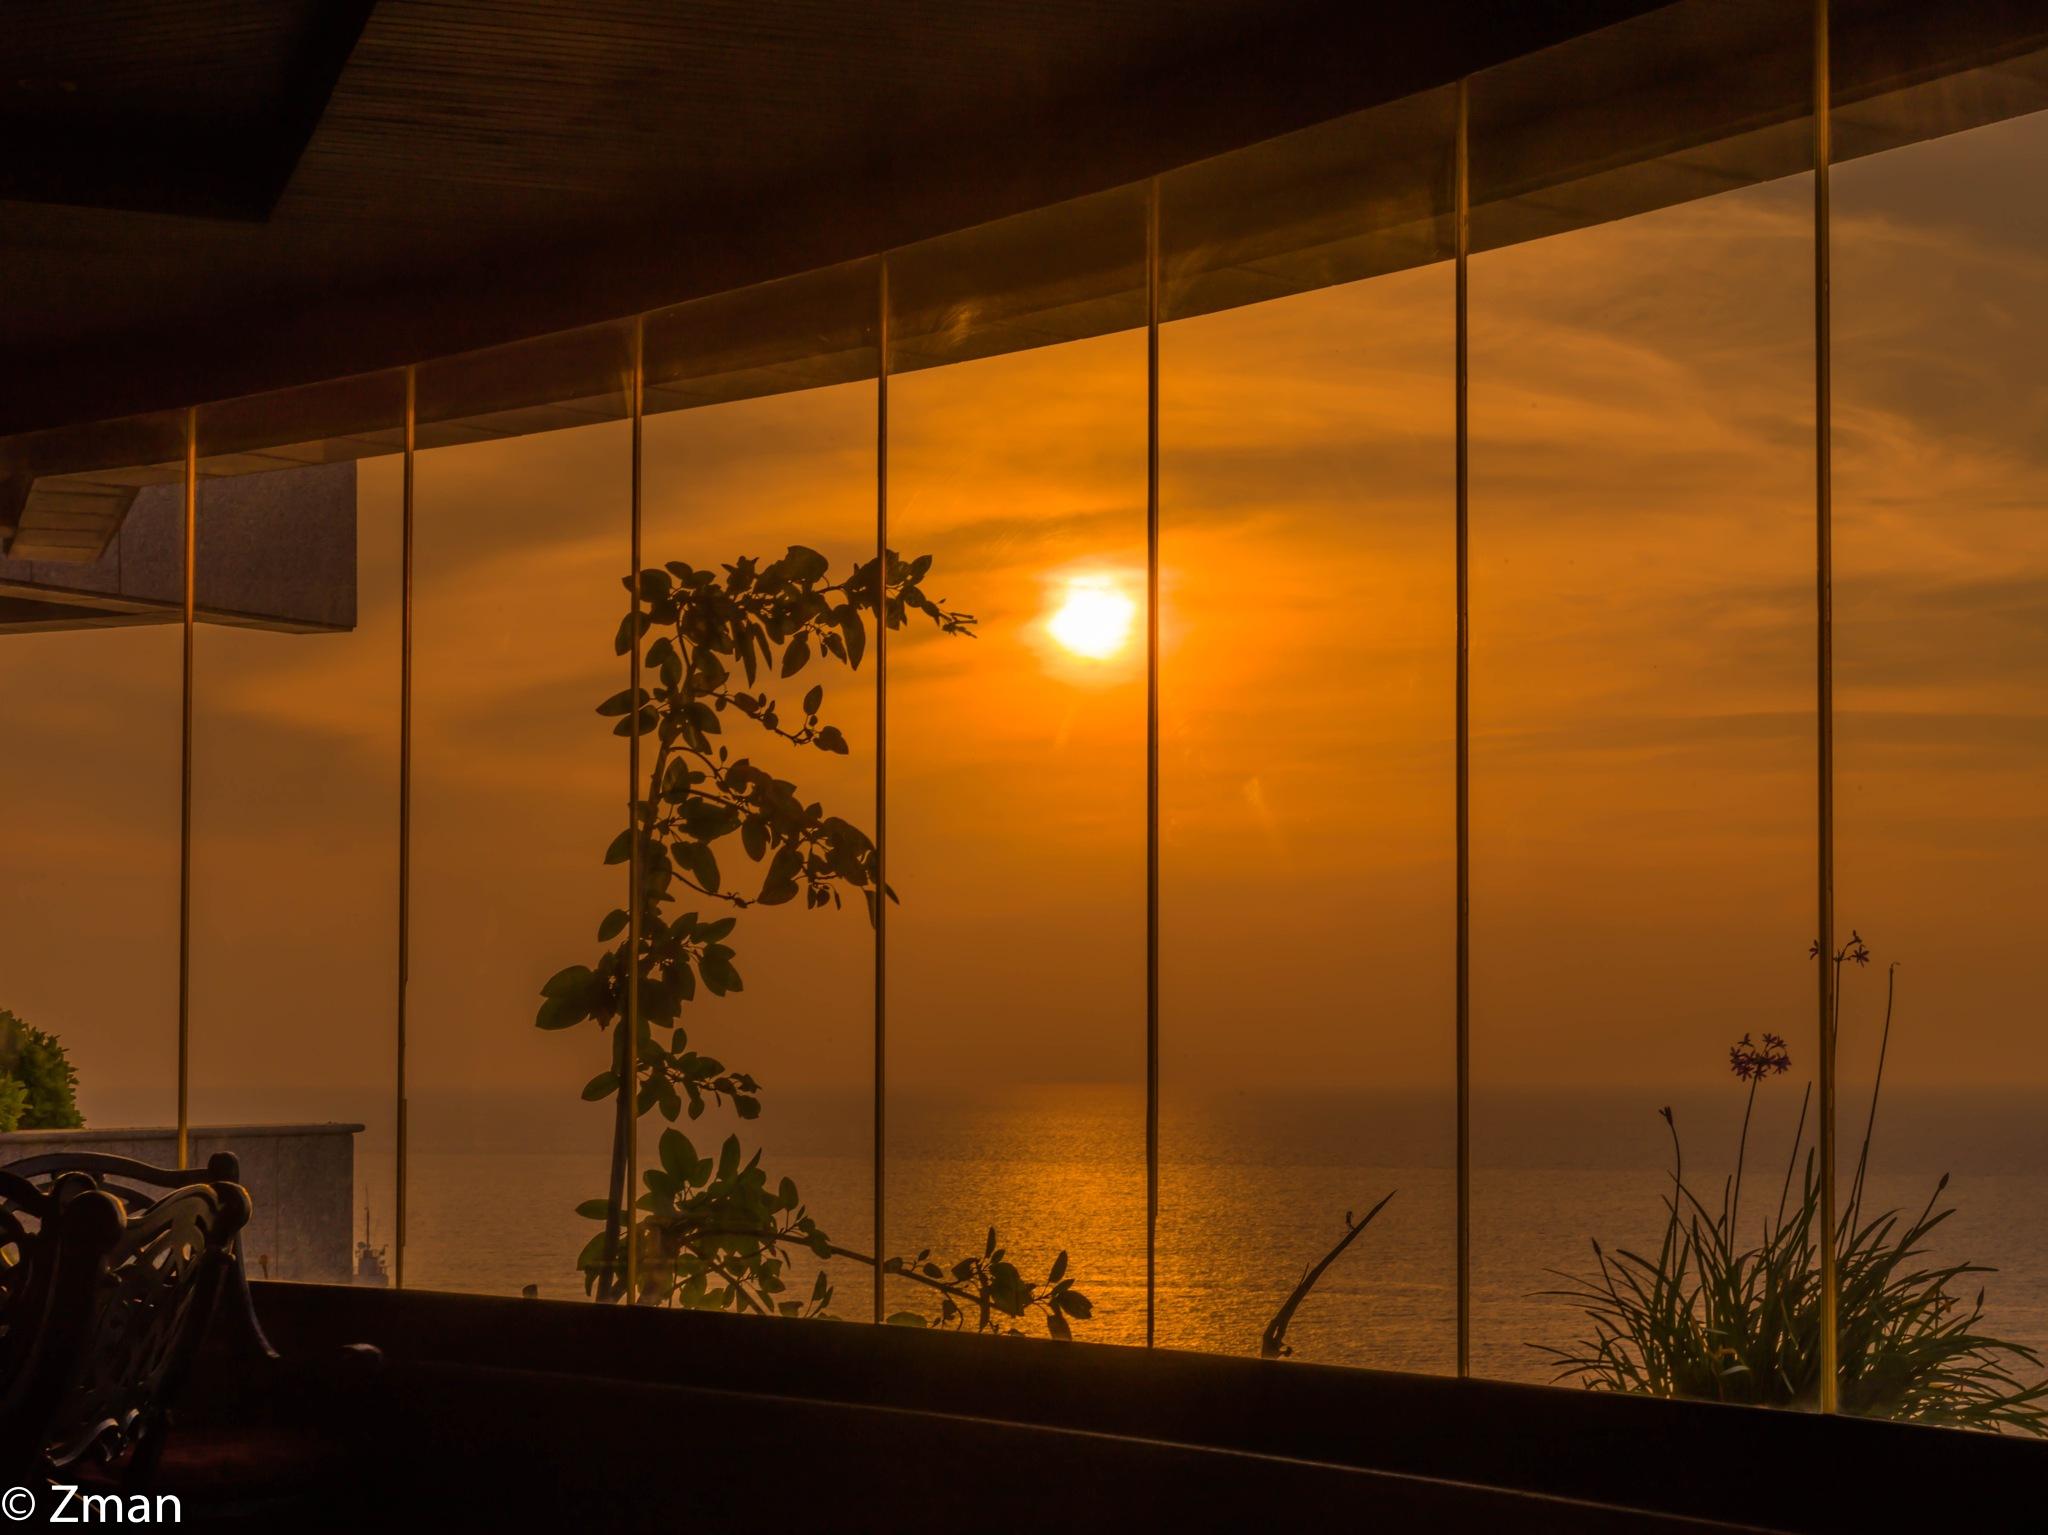 Sunset from my Balcony by muhammad.nasser.963